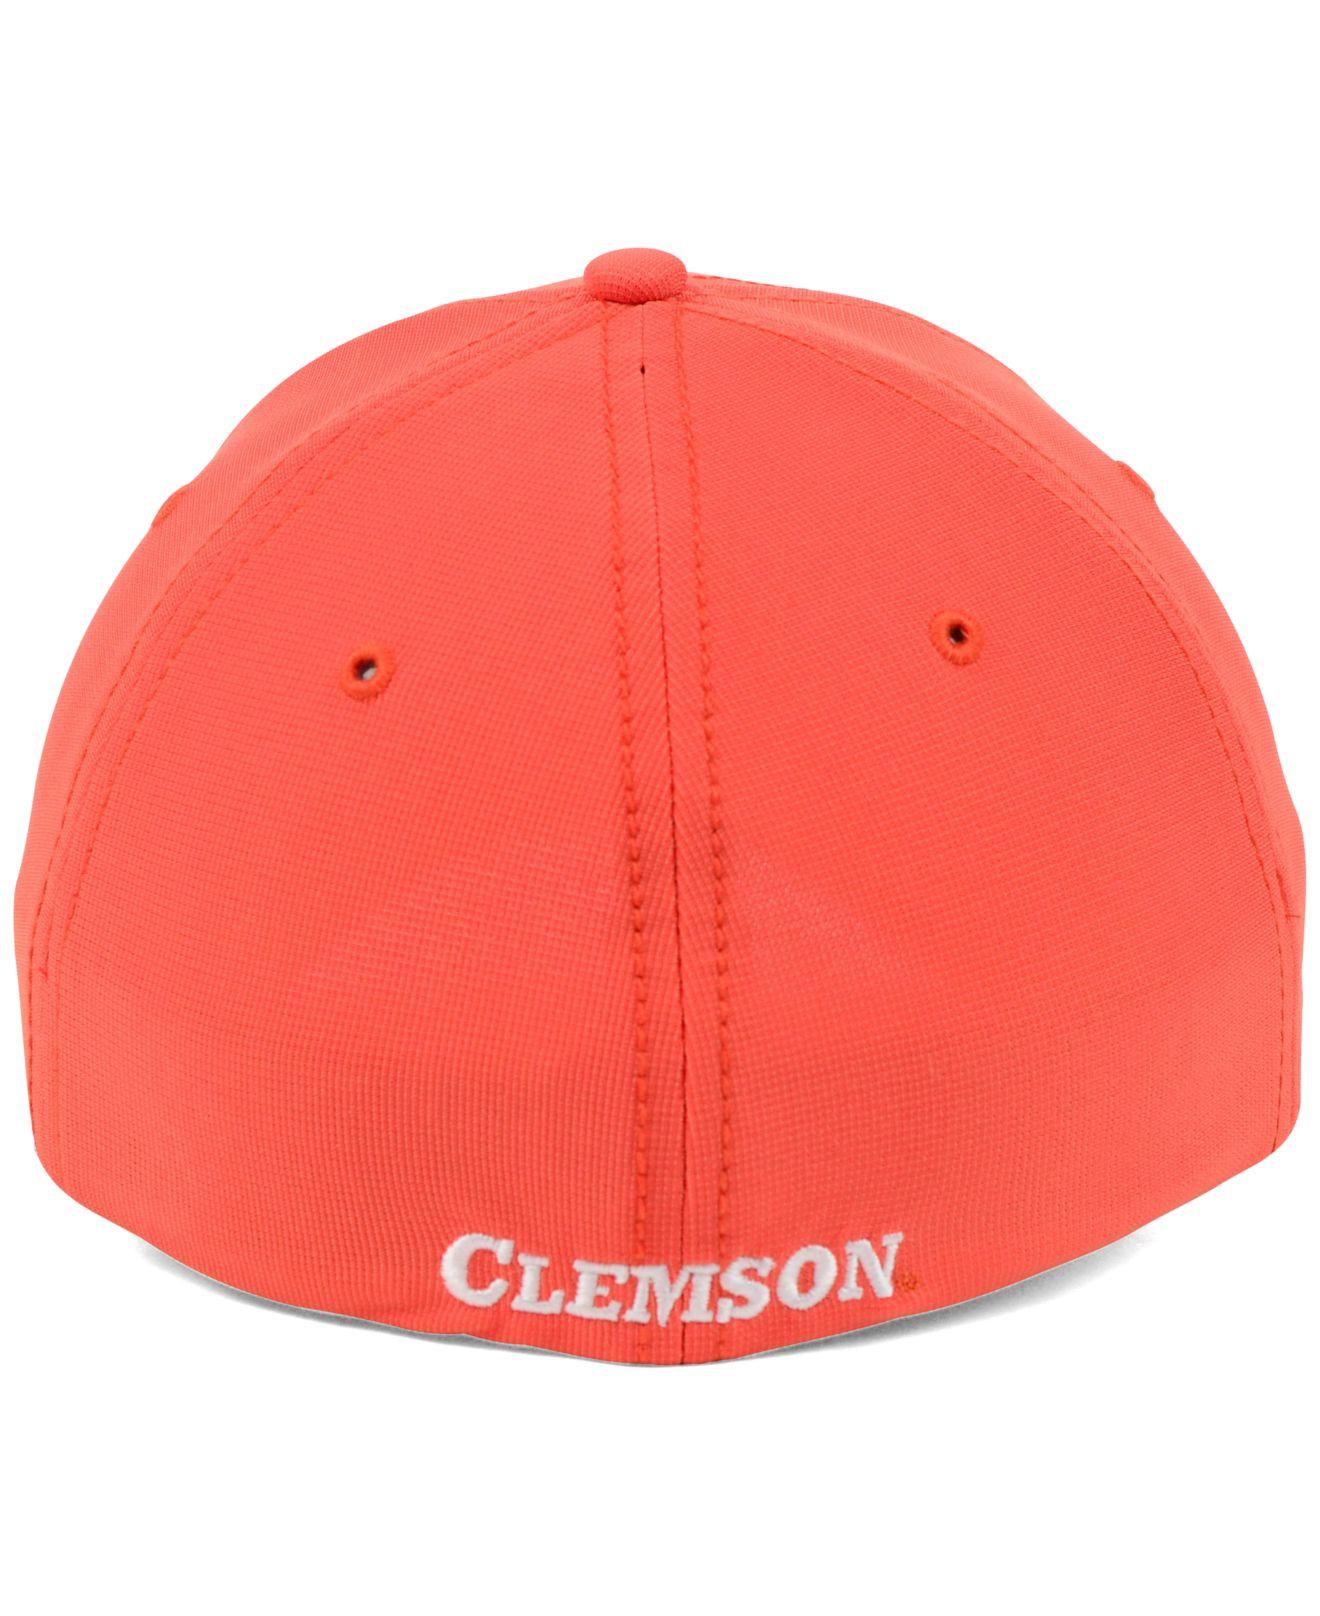 finest selection ef6bf 3f733 ... shop lyst 47 brand clemson tigers ncaa gametime closer cap in orange  c2e53 682bb